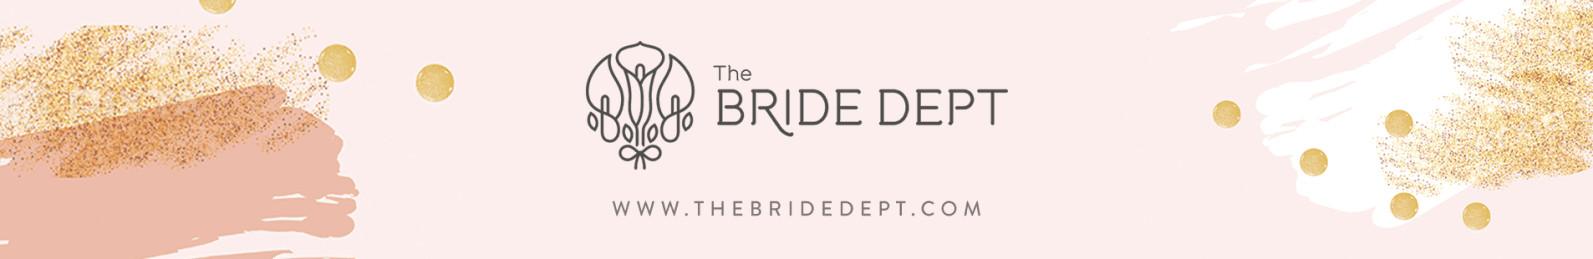 The Bride Dept